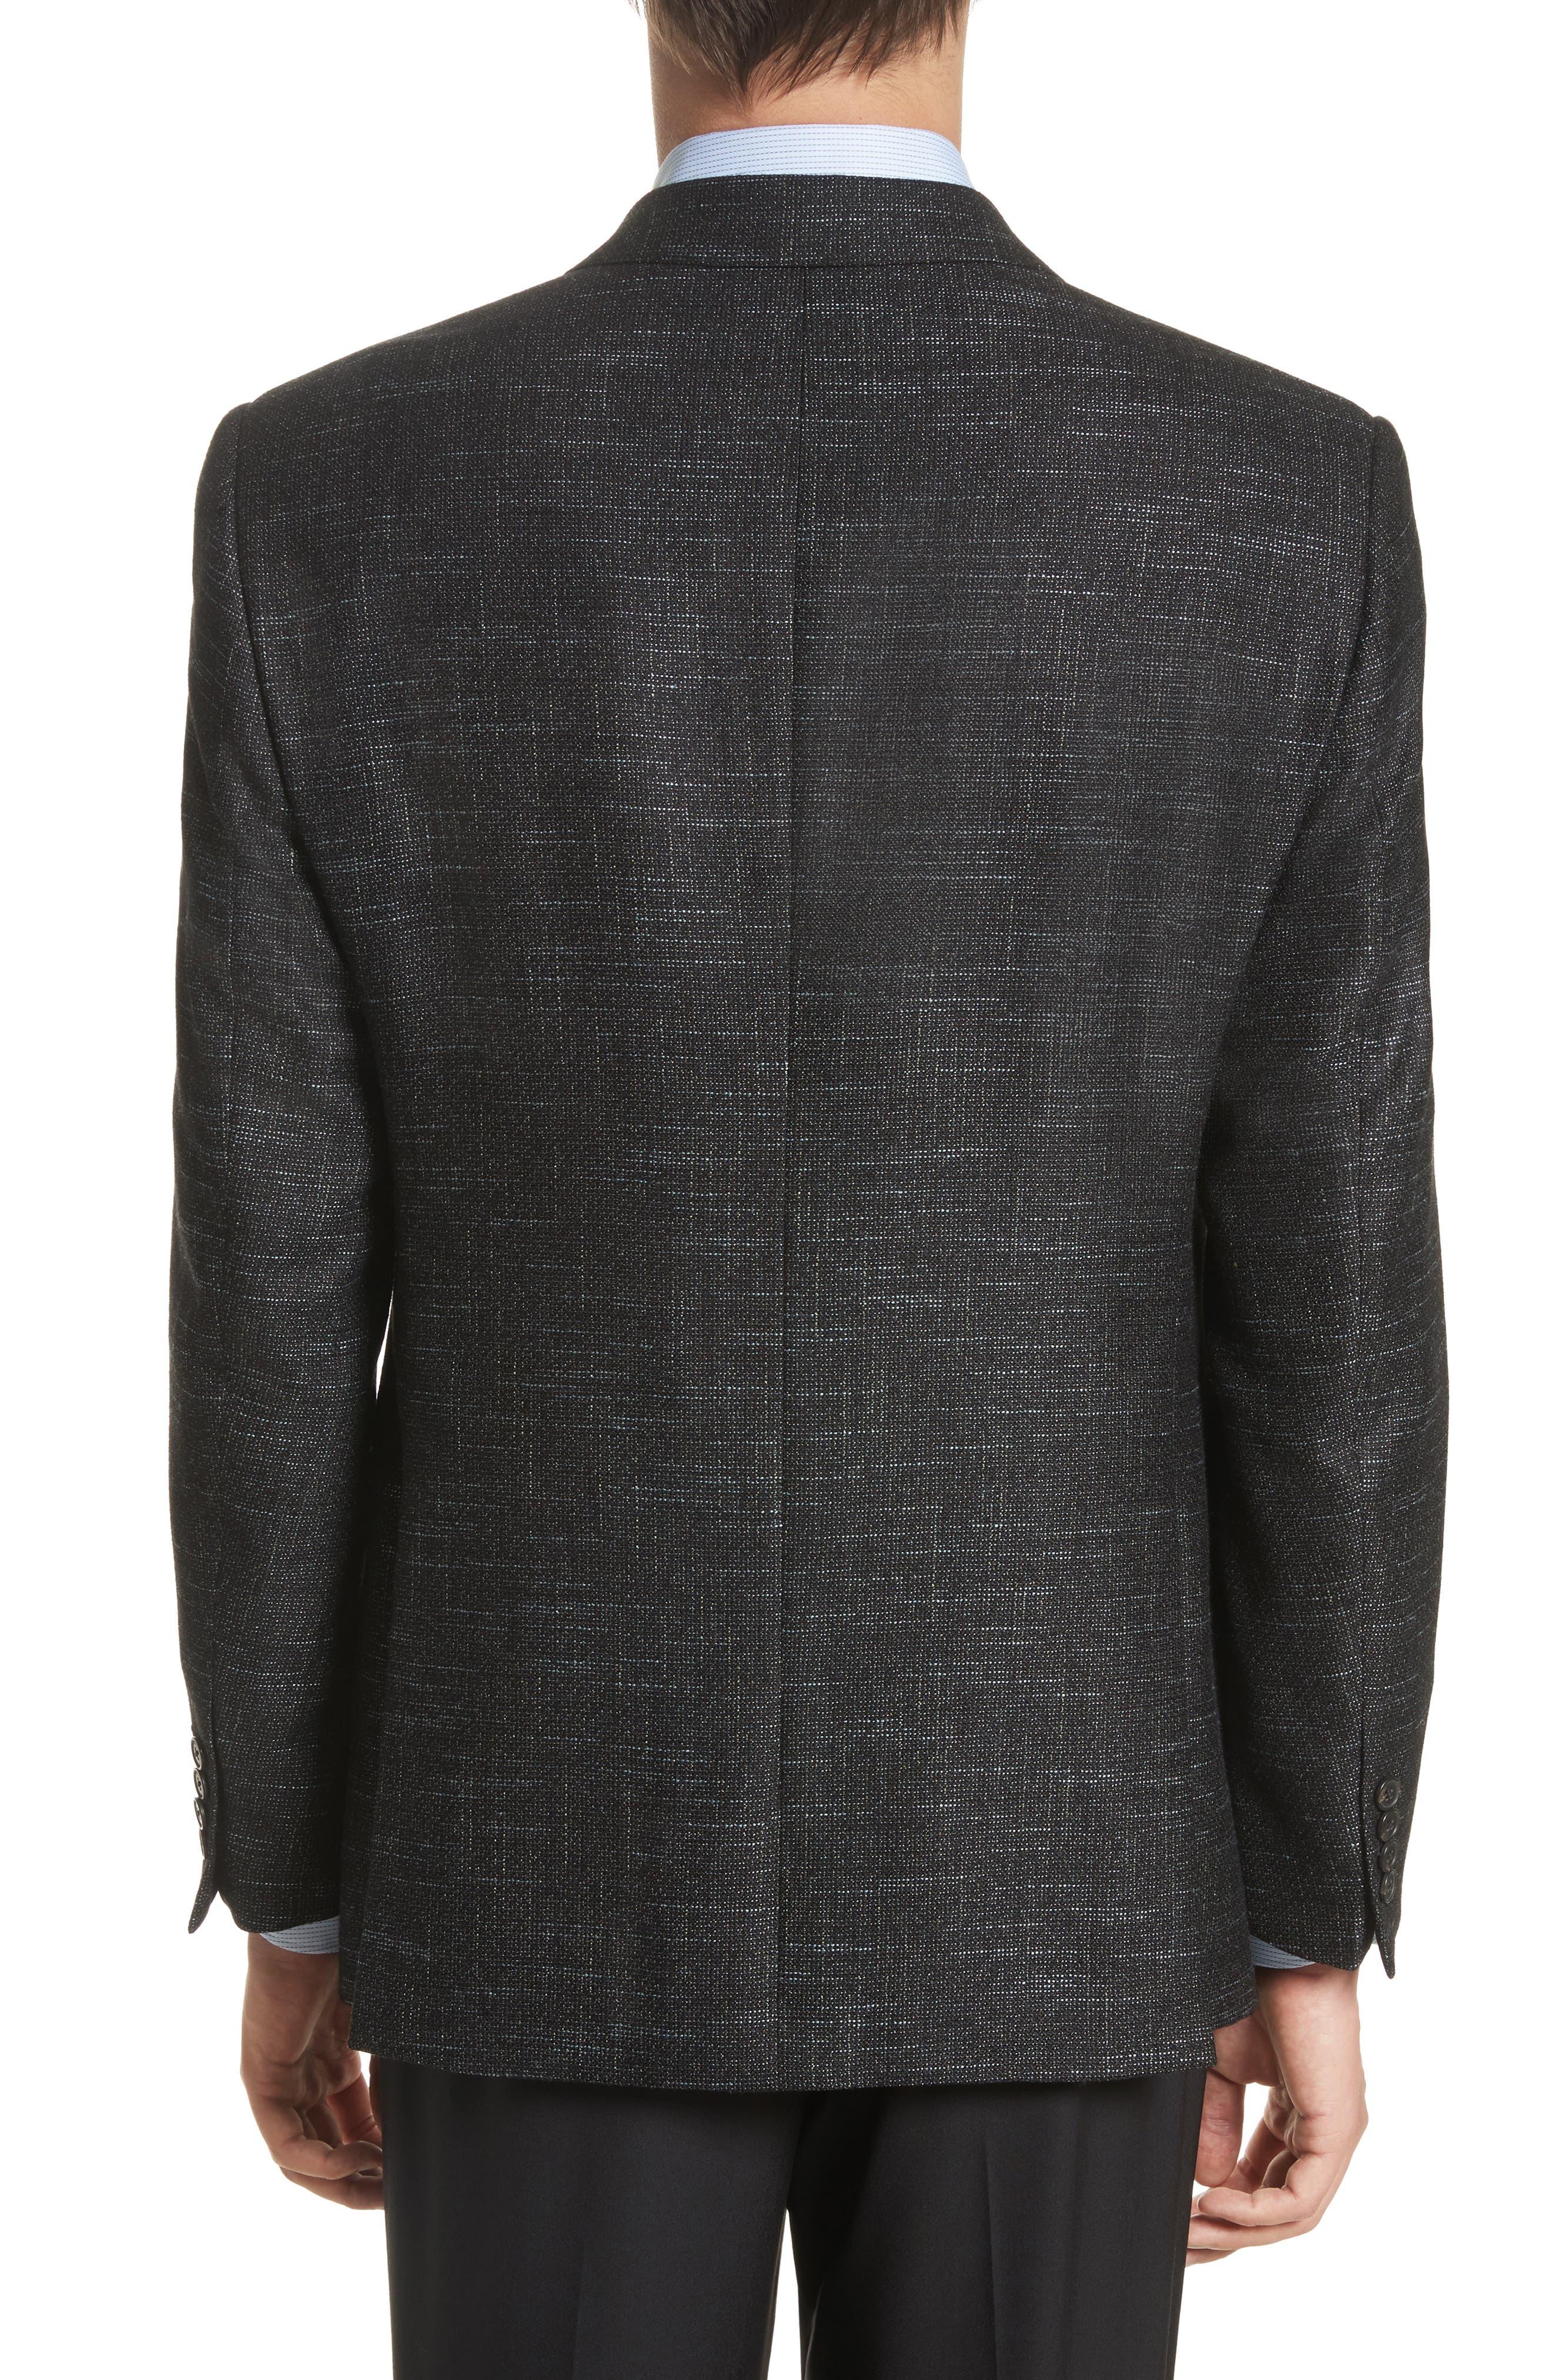 G-Line Trim Fit Wool Blend Blazer,                             Alternate thumbnail 2, color,                             Celery